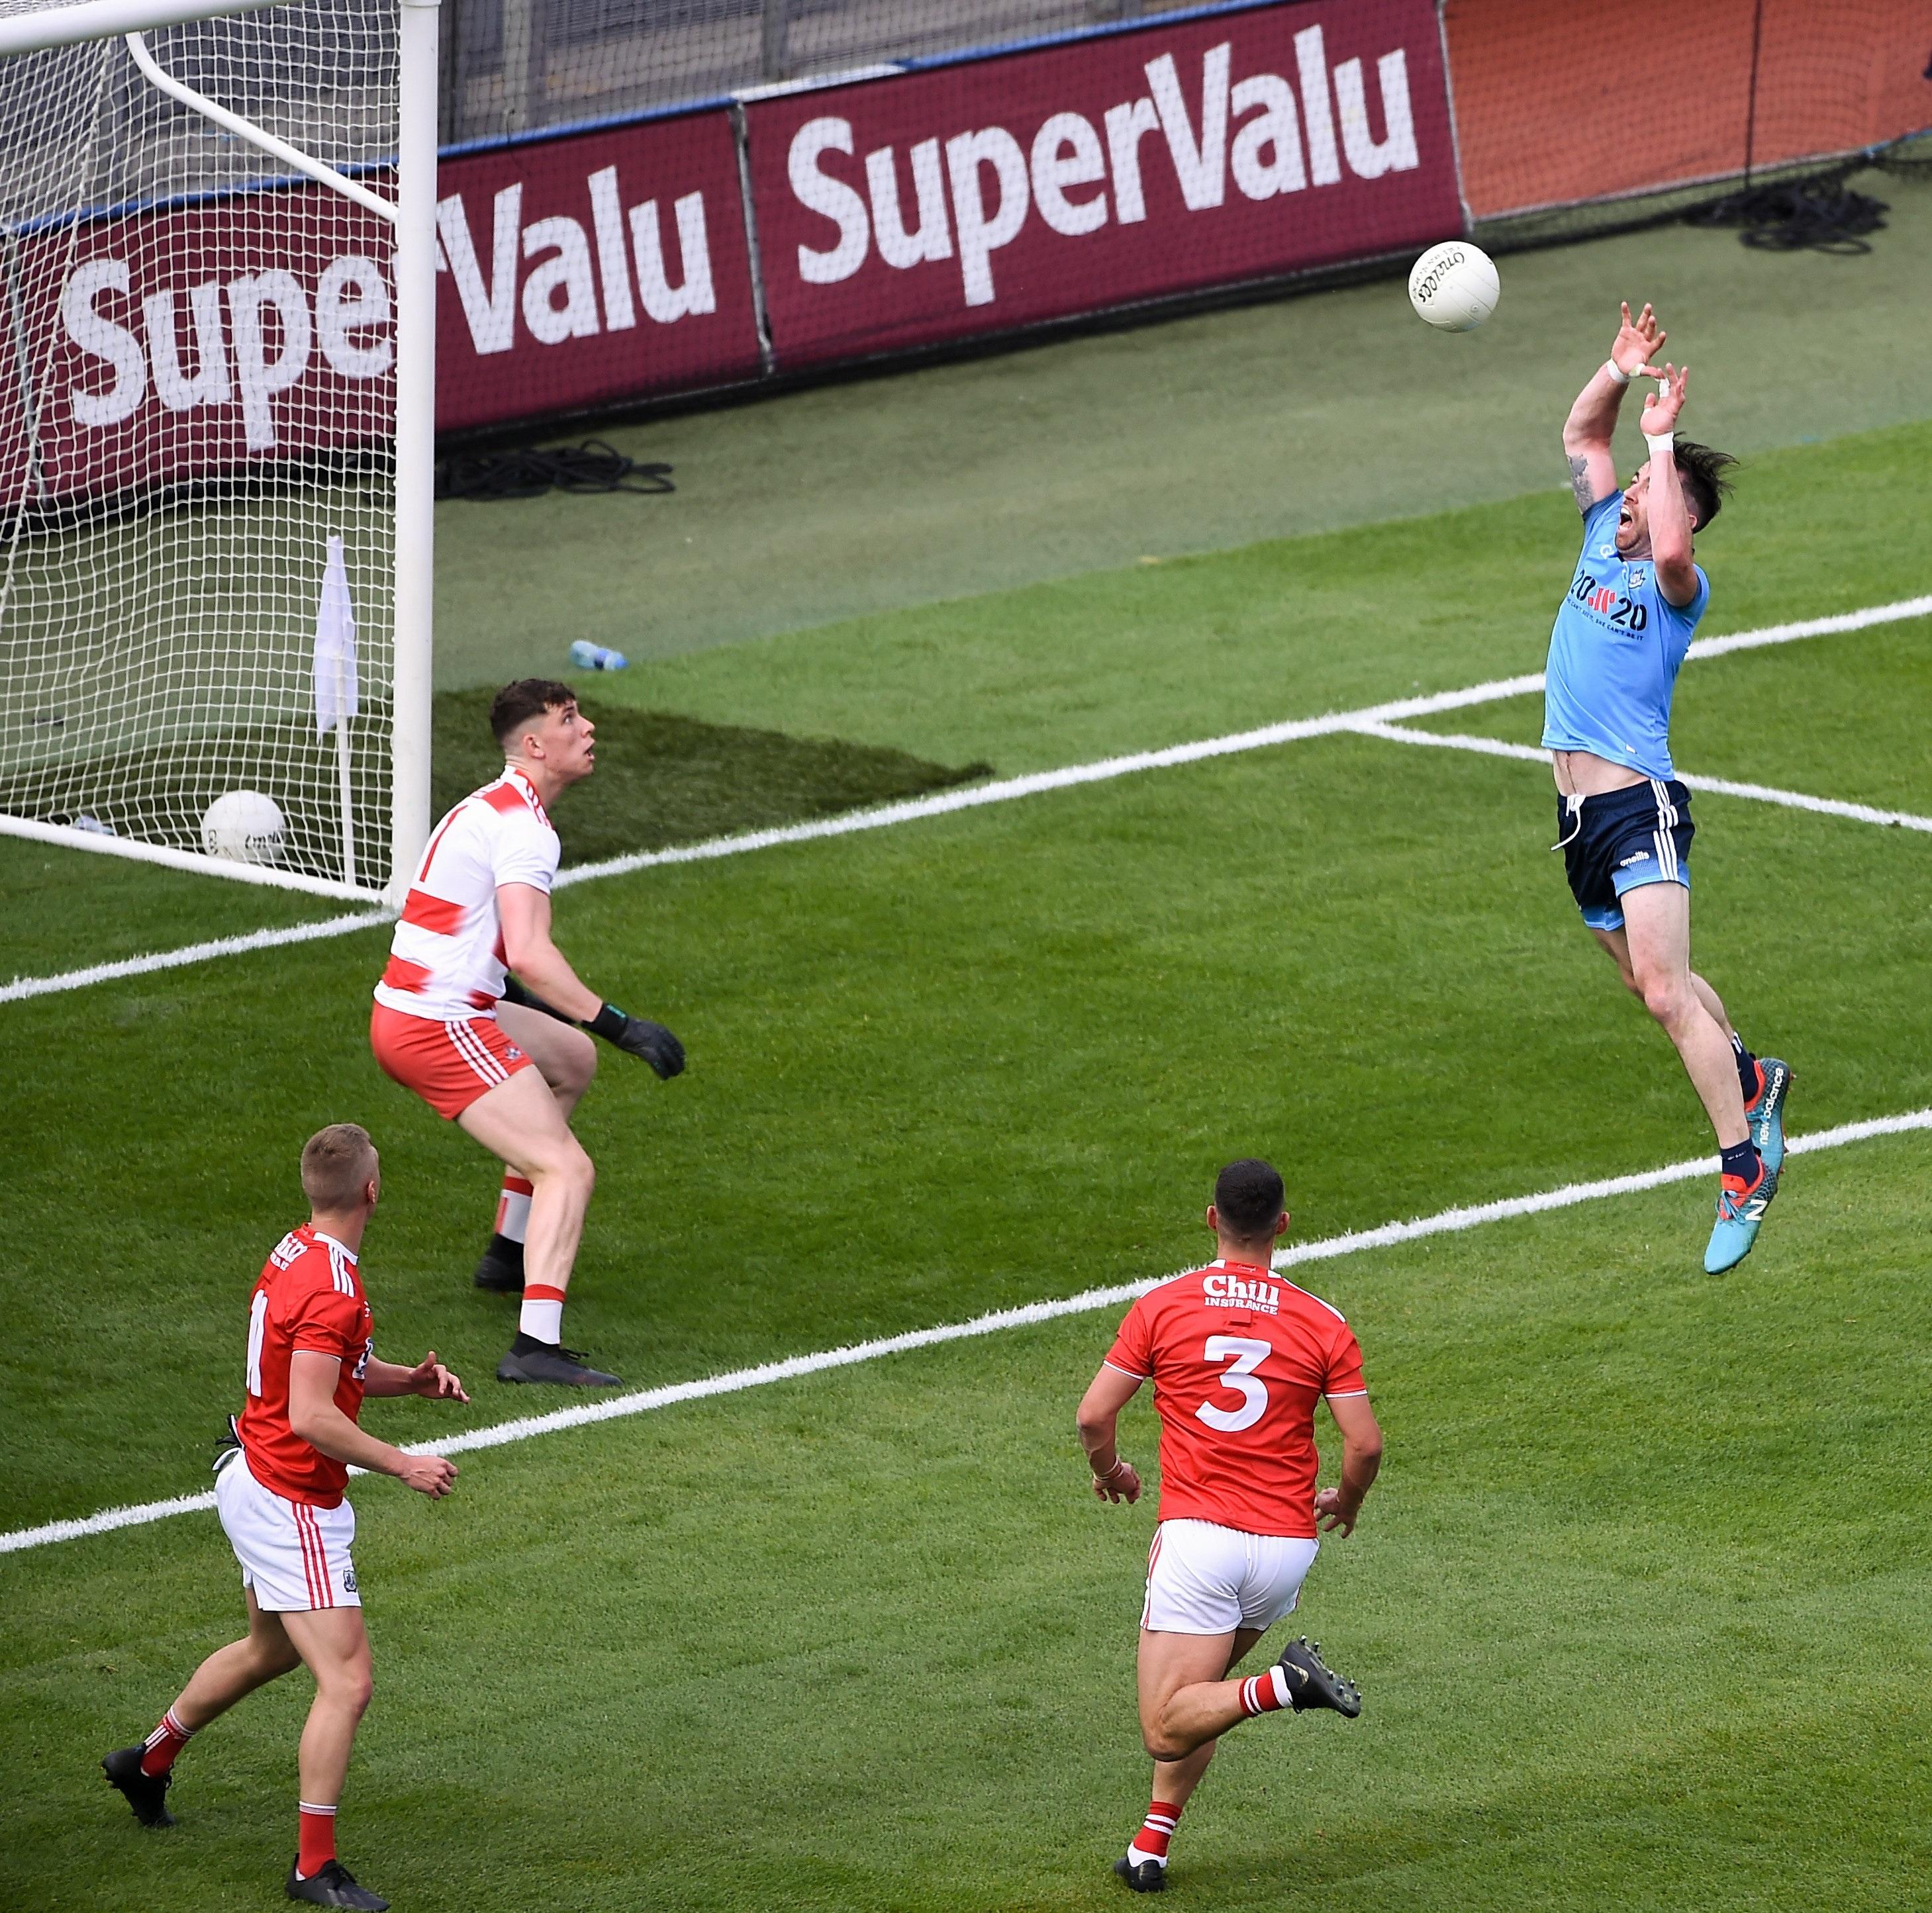 Cork hit by late burst but not before unsettling Dublin